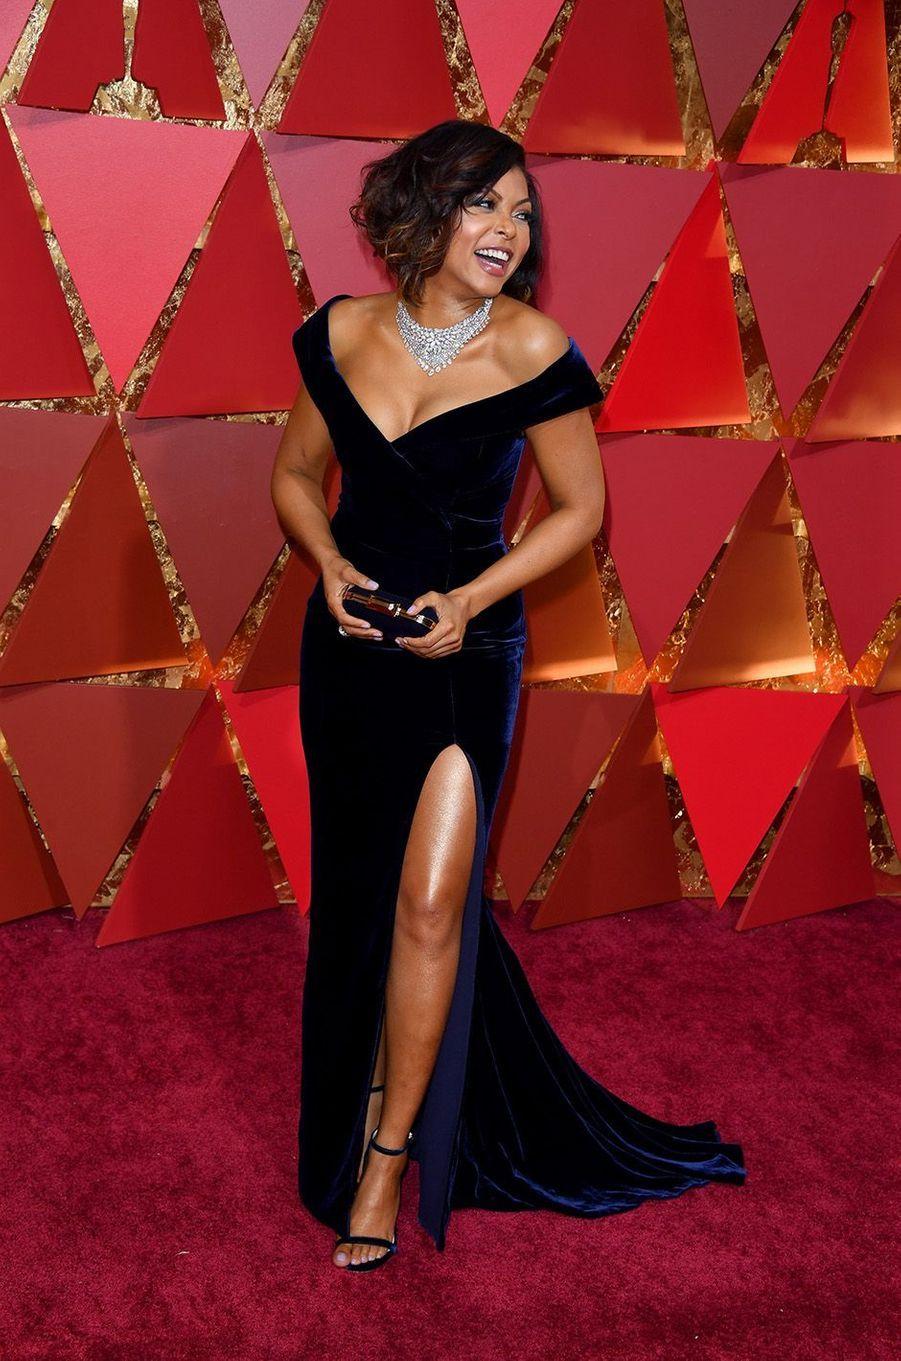 Taraji P. Henson lors de la cérémonie des Oscars 2017.